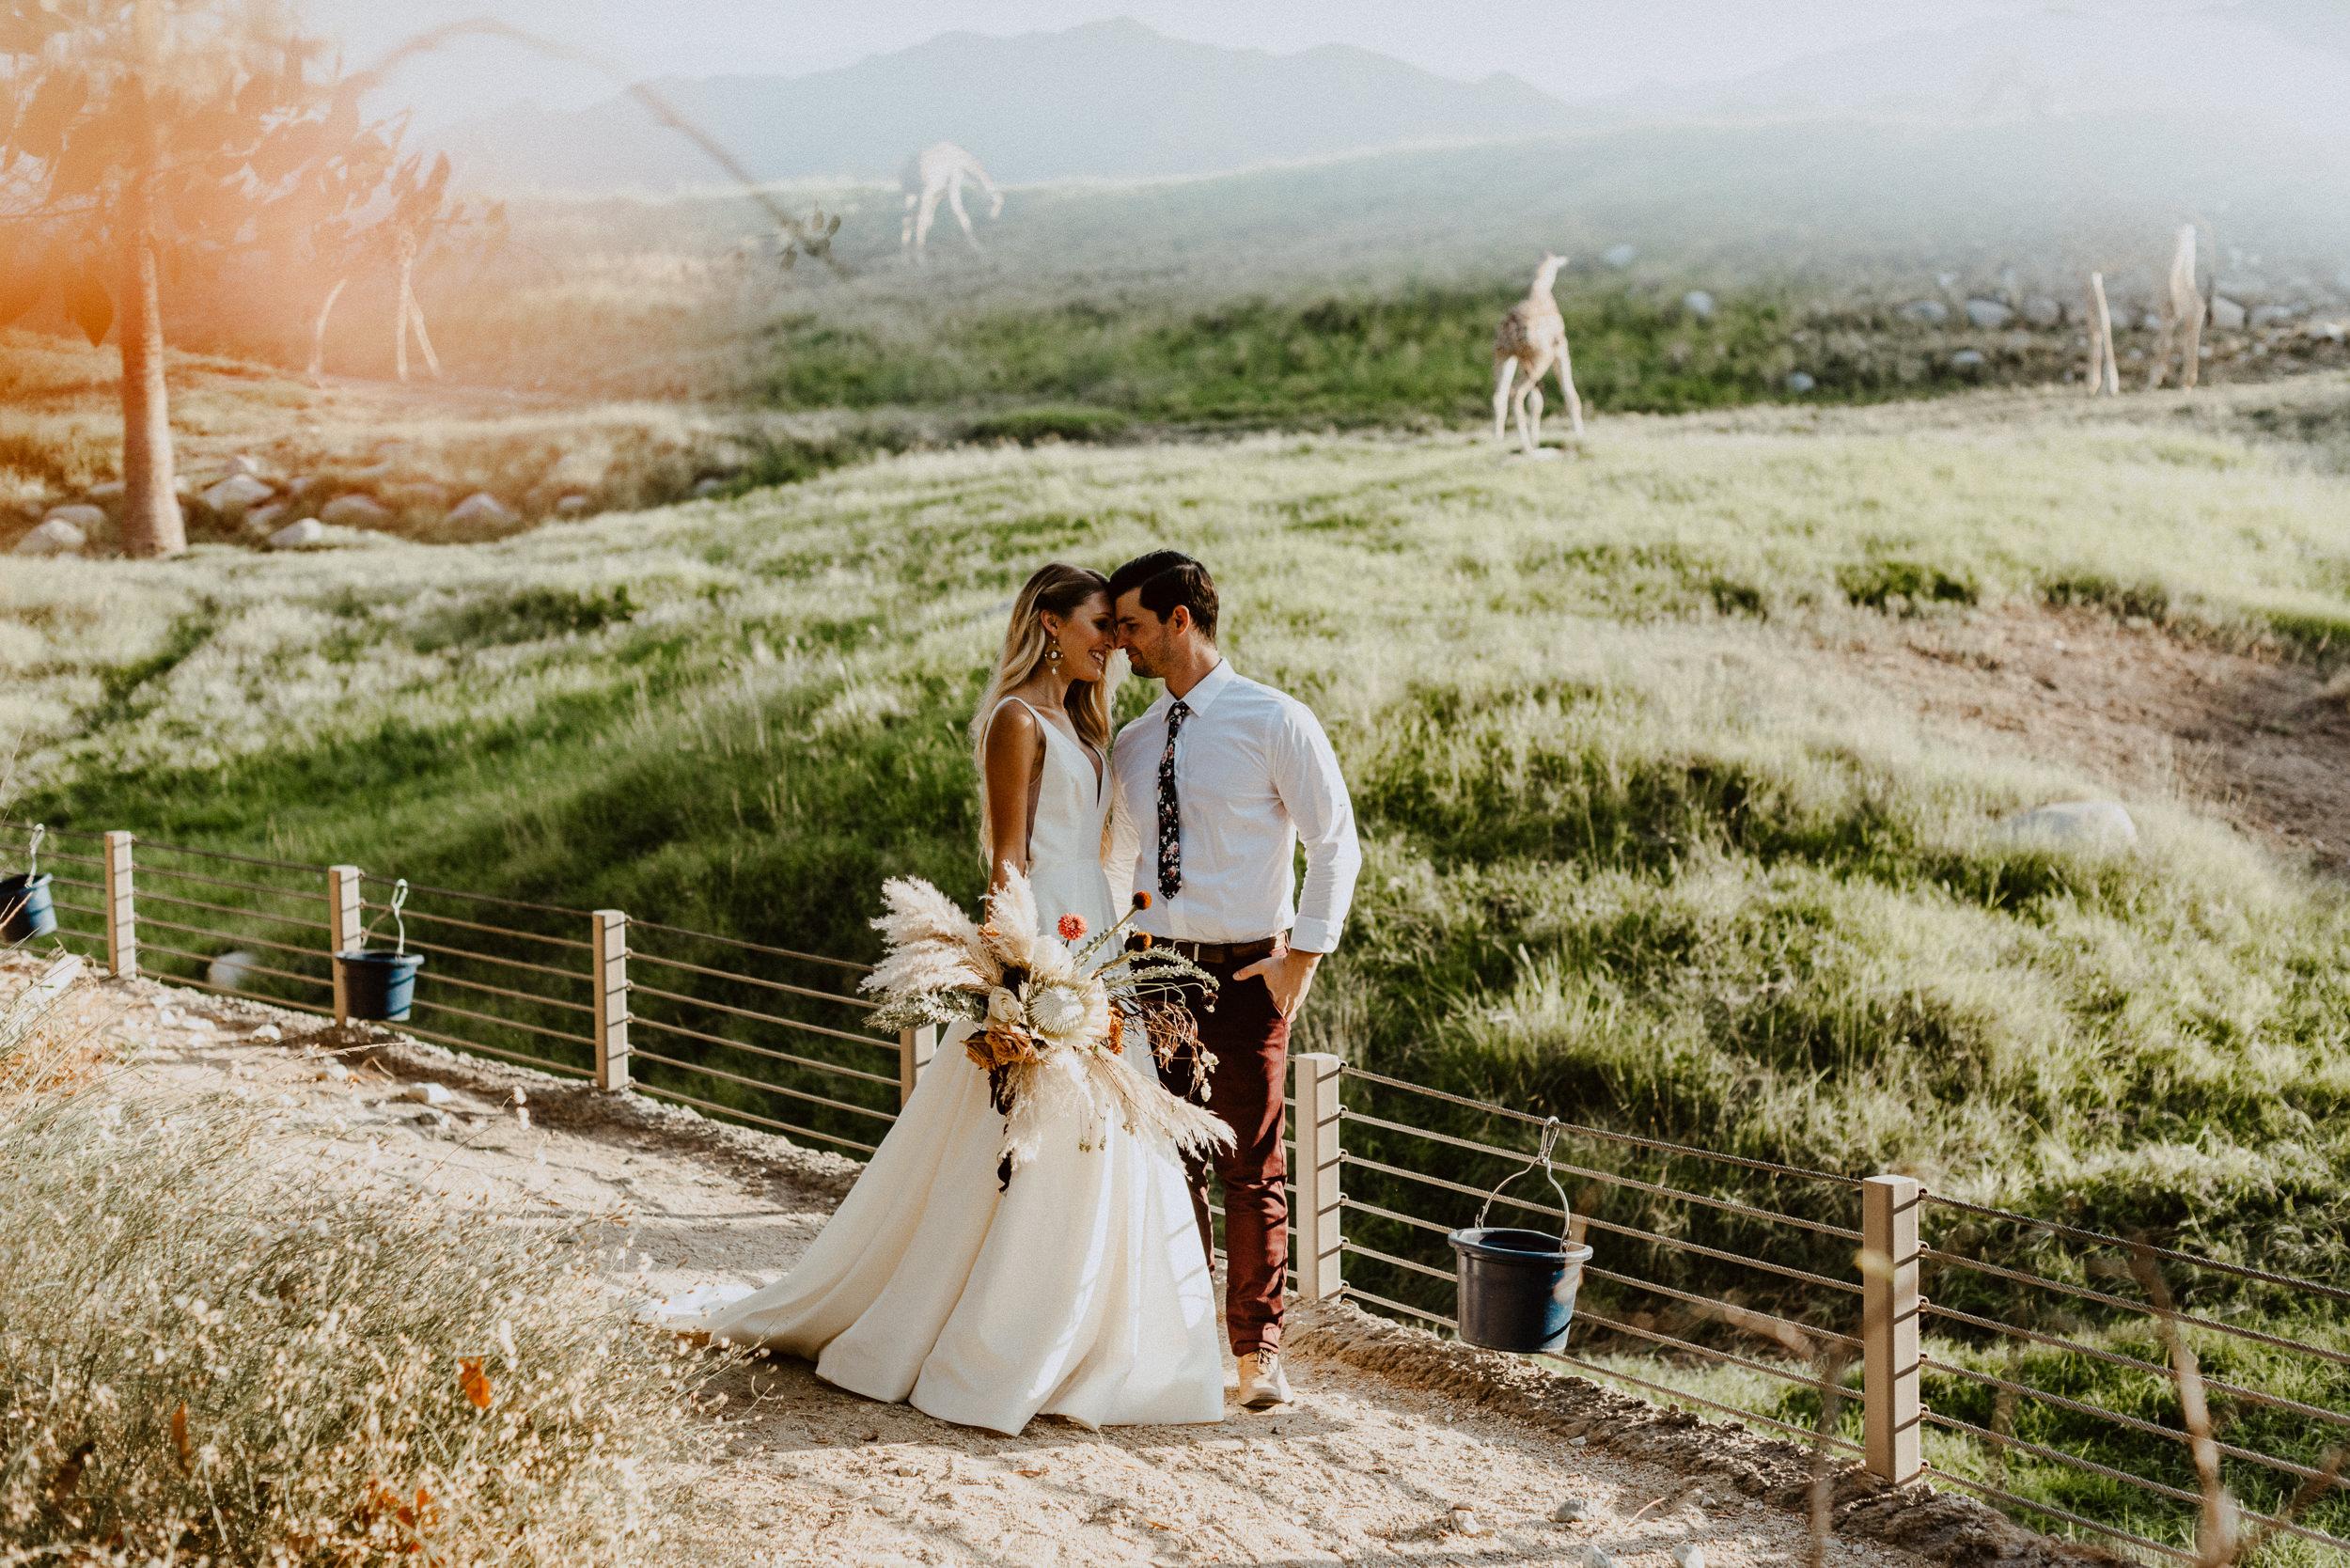 sChelsie + Chris - The Desert Shootout Wedding Romantics at The Living Desert-93.jpg